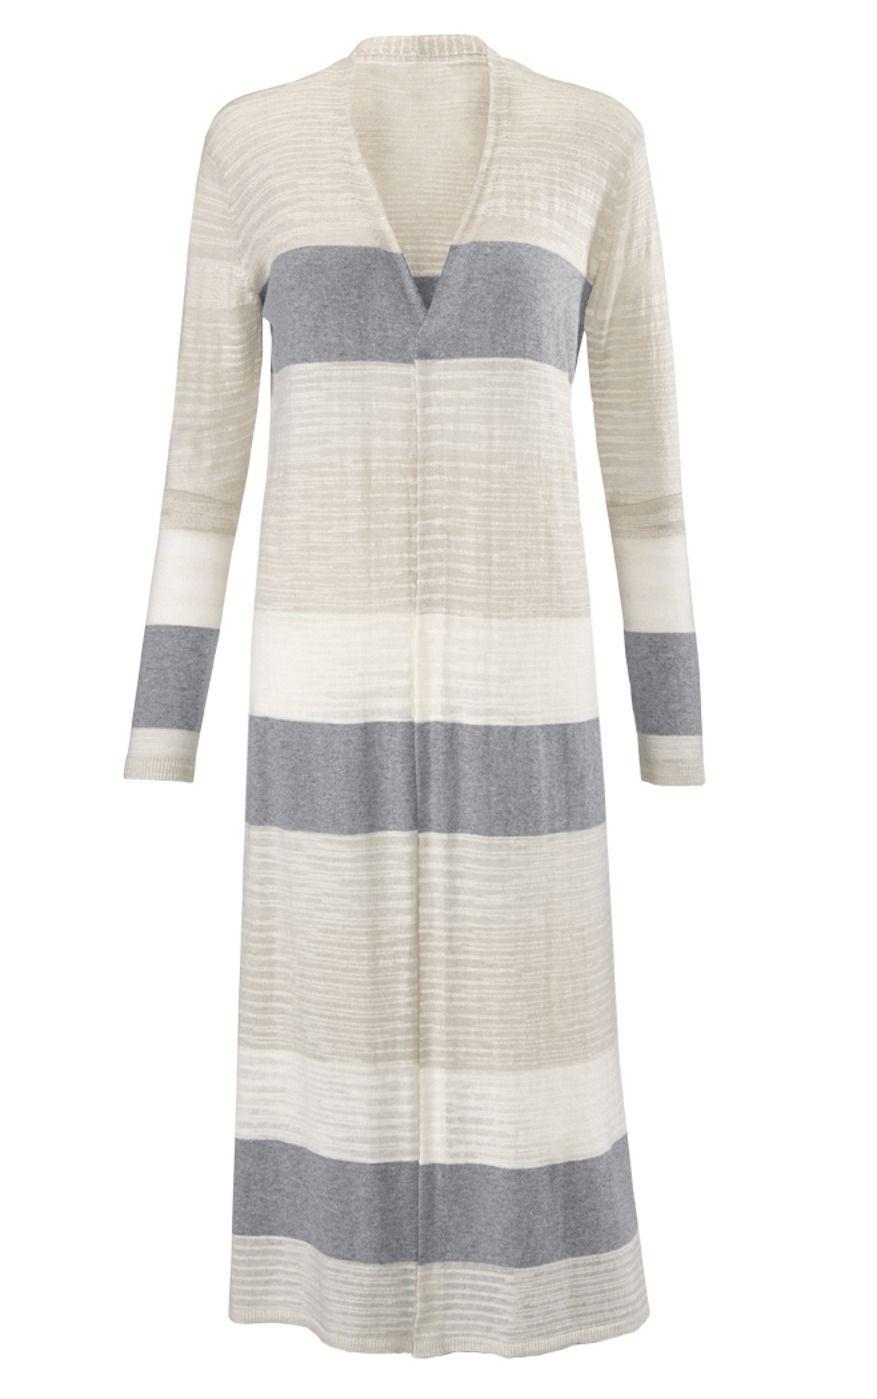 Vineyard Sweater - cabi Spring 2016 Collection | I love CAbi ...